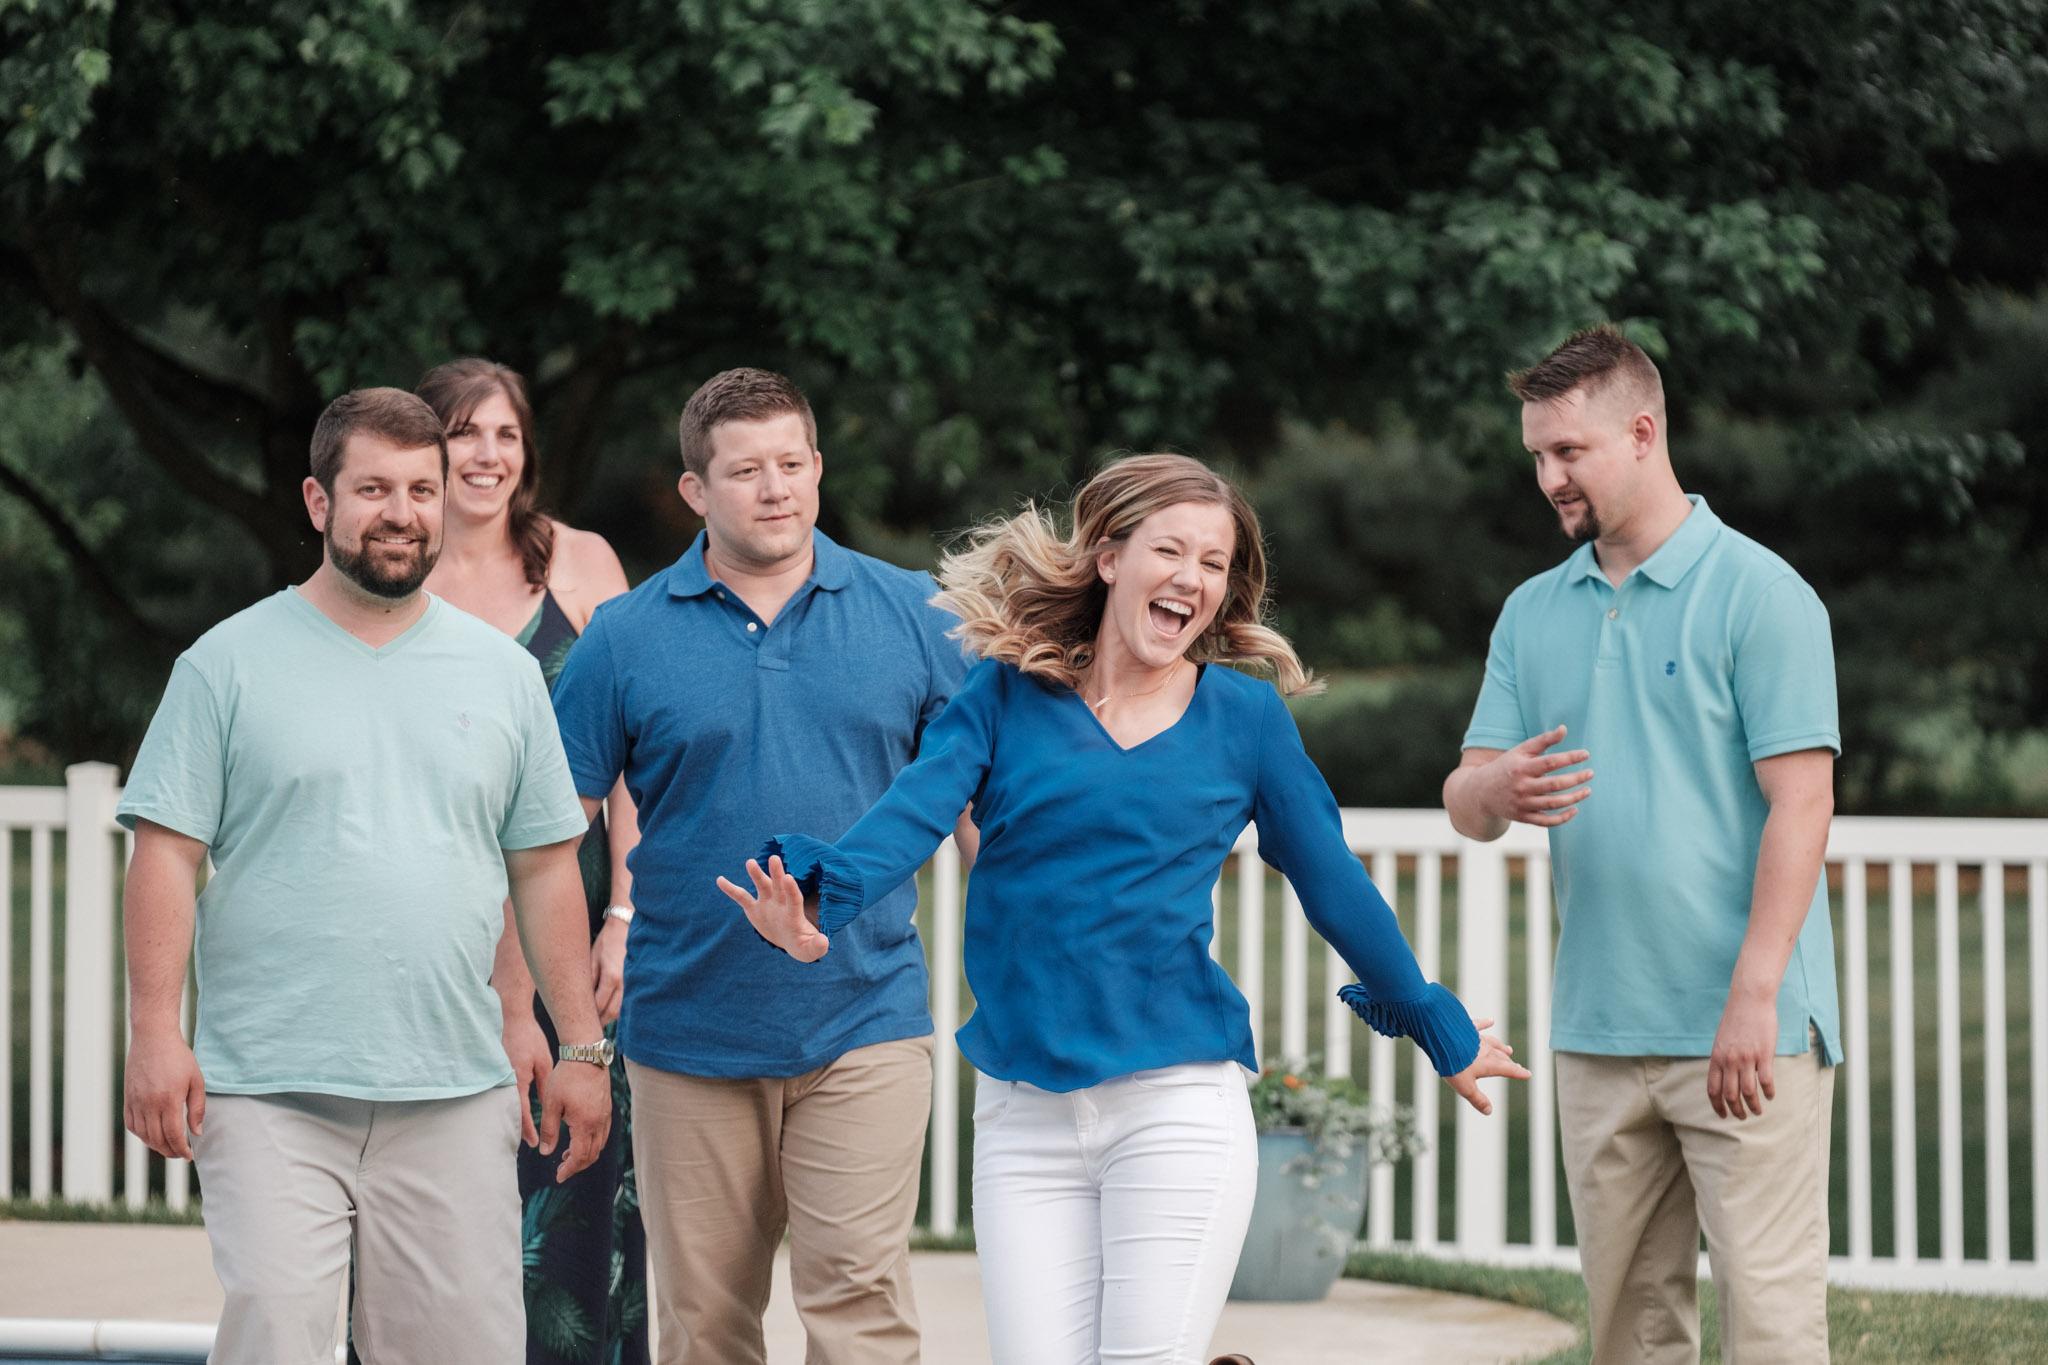 2018 BAP Vandiver Family Photos Roscoe-19.jpg